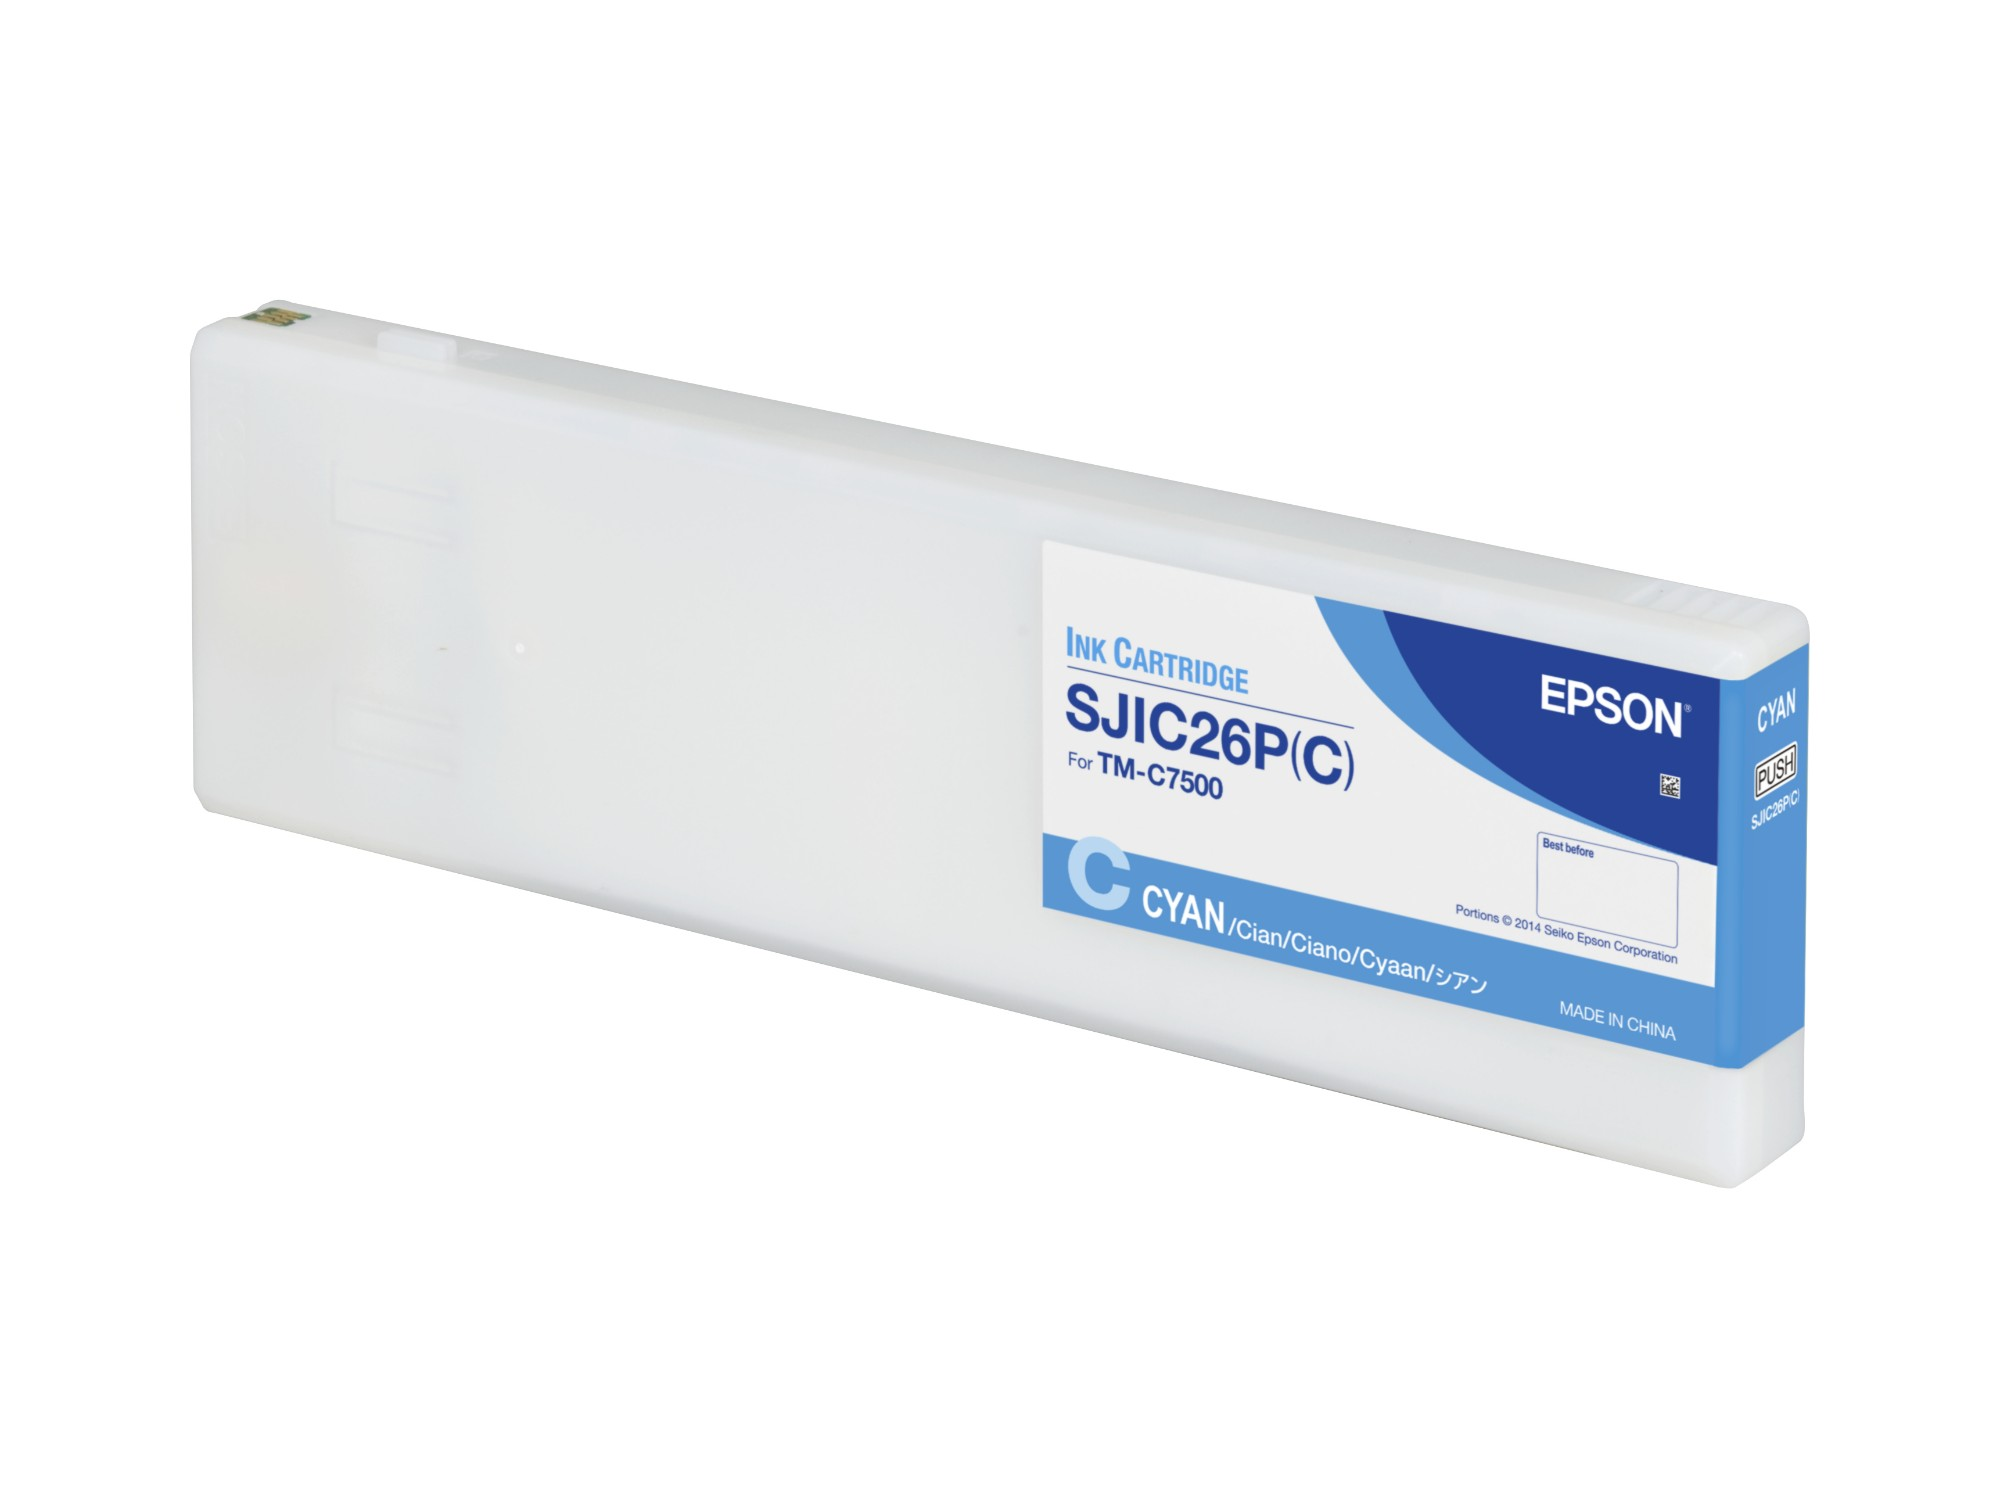 Epson SJIC26P(C): Ink cartridge for ColorWorks C7500 (Cyan)